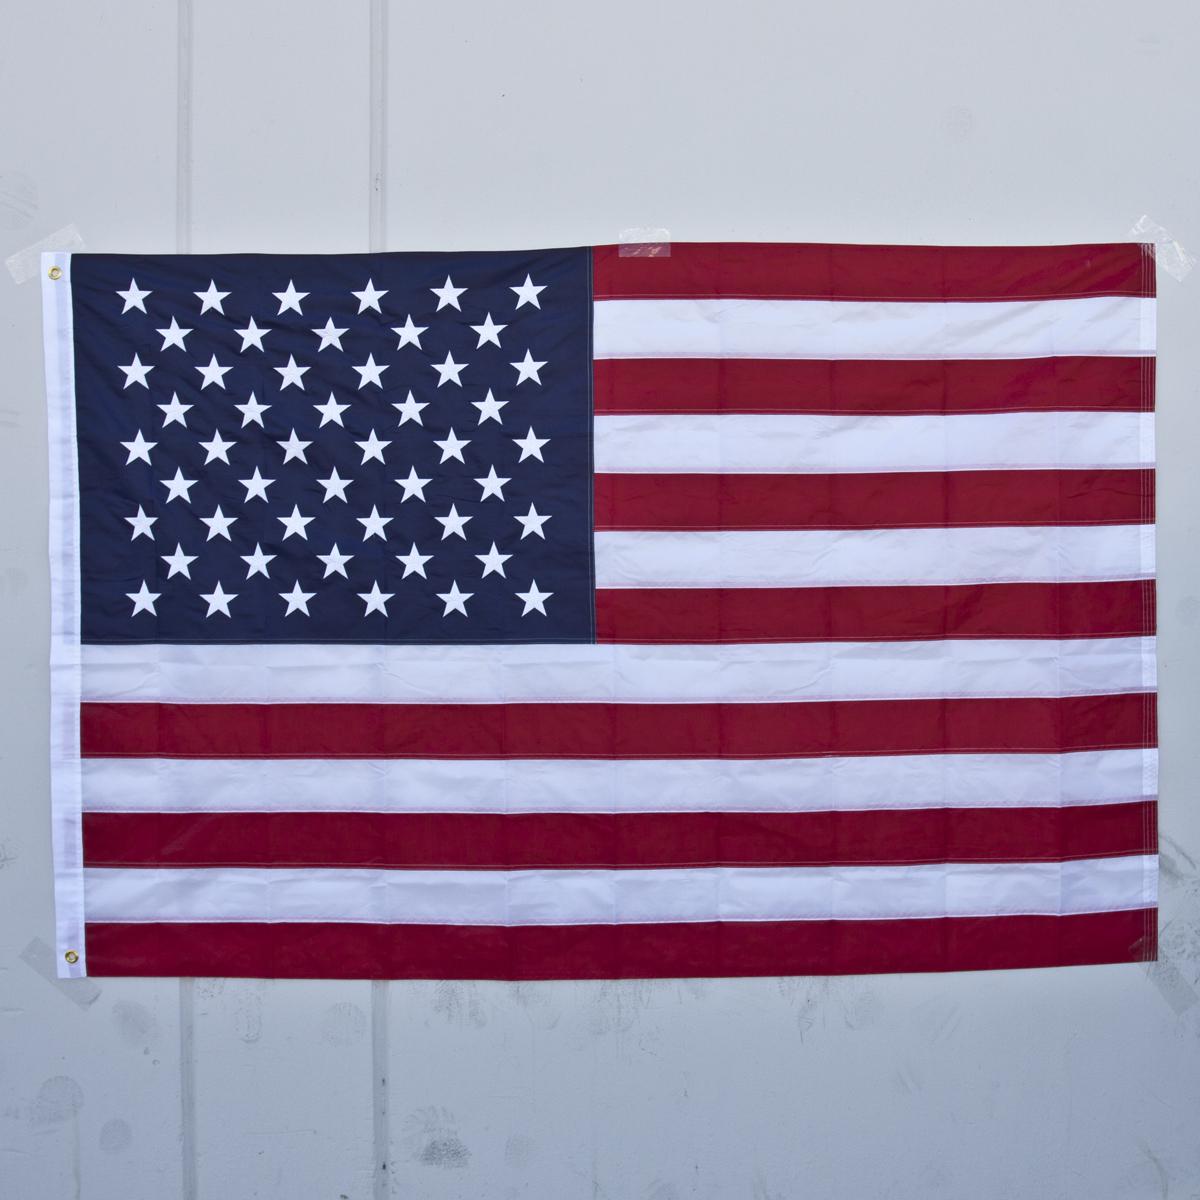 New American Flag USA 3'x5' FT U.S.Sewn Stripes